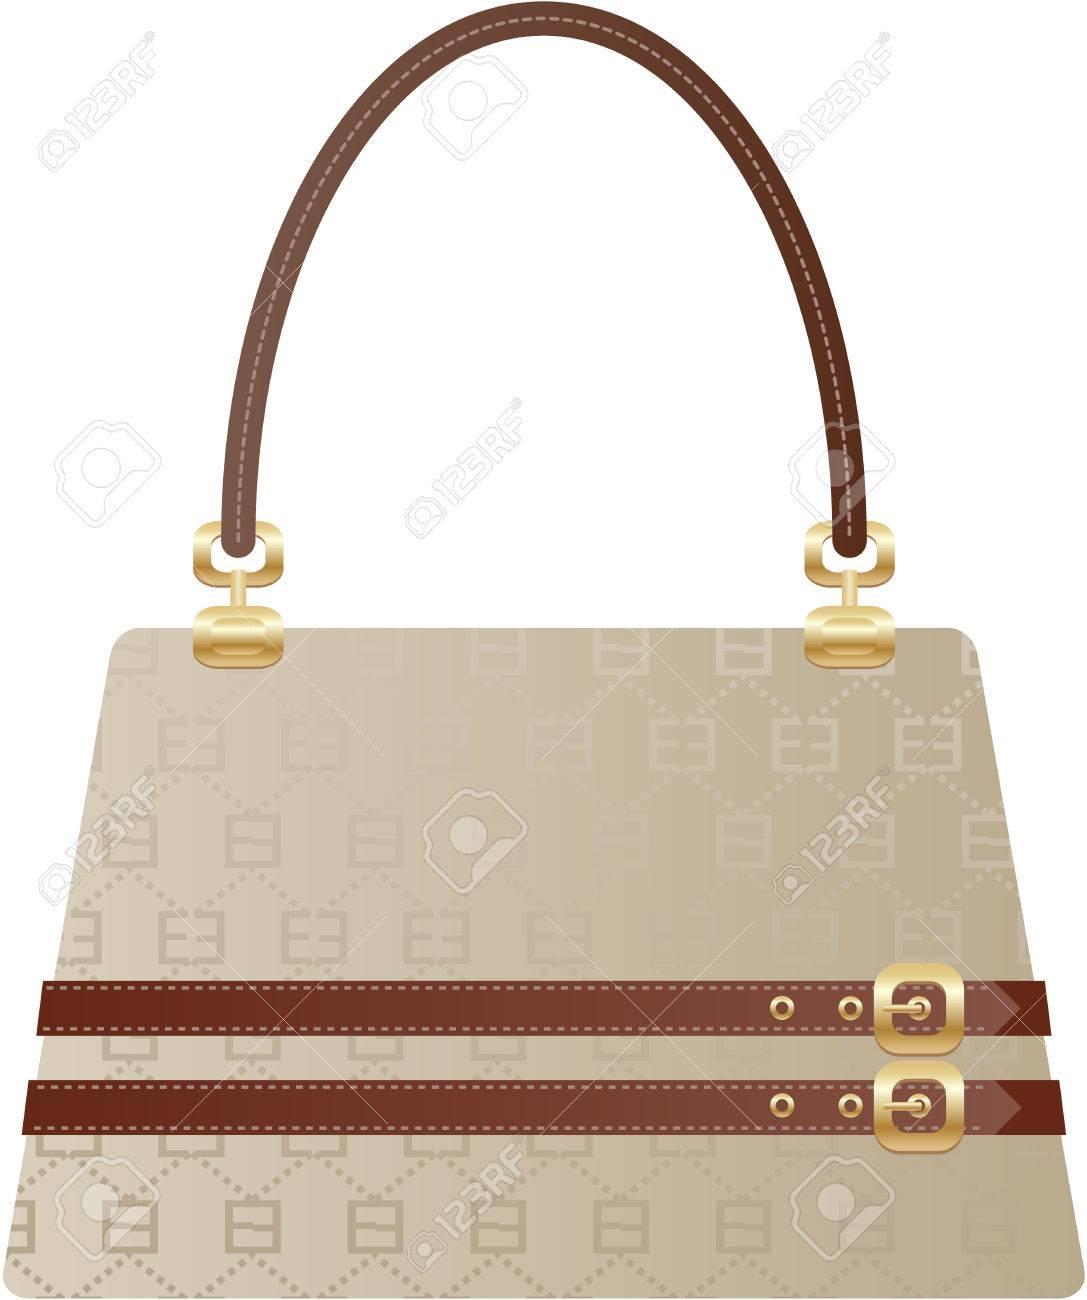 beautiful handbag  purse on the white back ground Stock Vector - 6264878